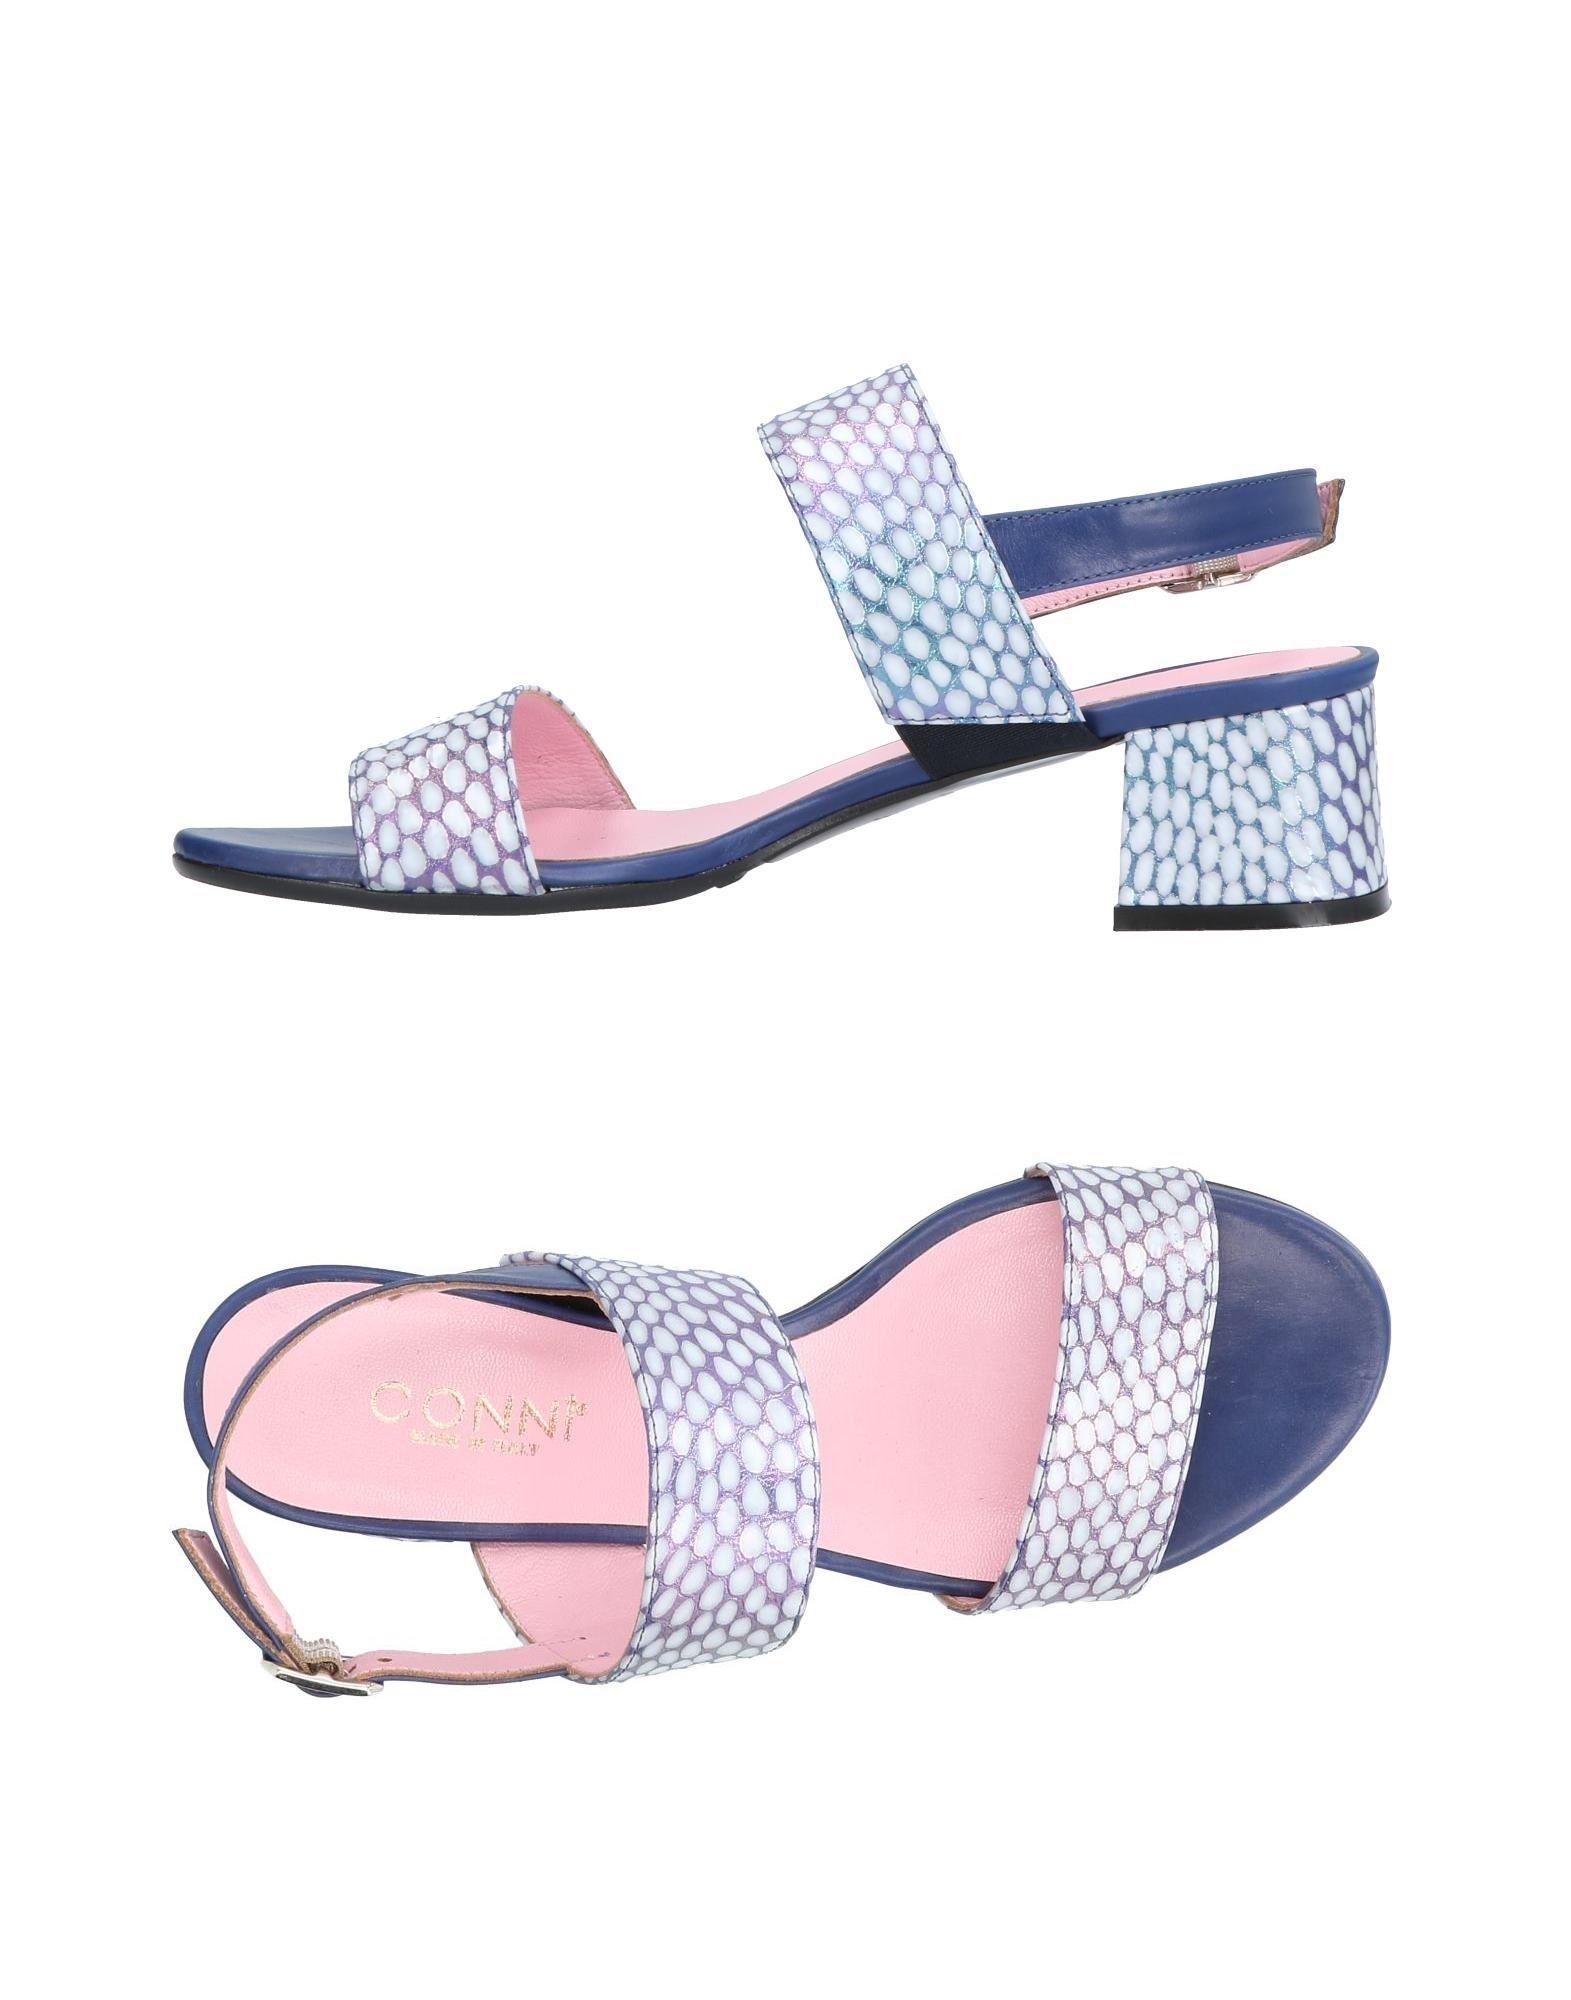 Conni Sandalen Damen  11412527VE Gute Qualität beliebte Schuhe